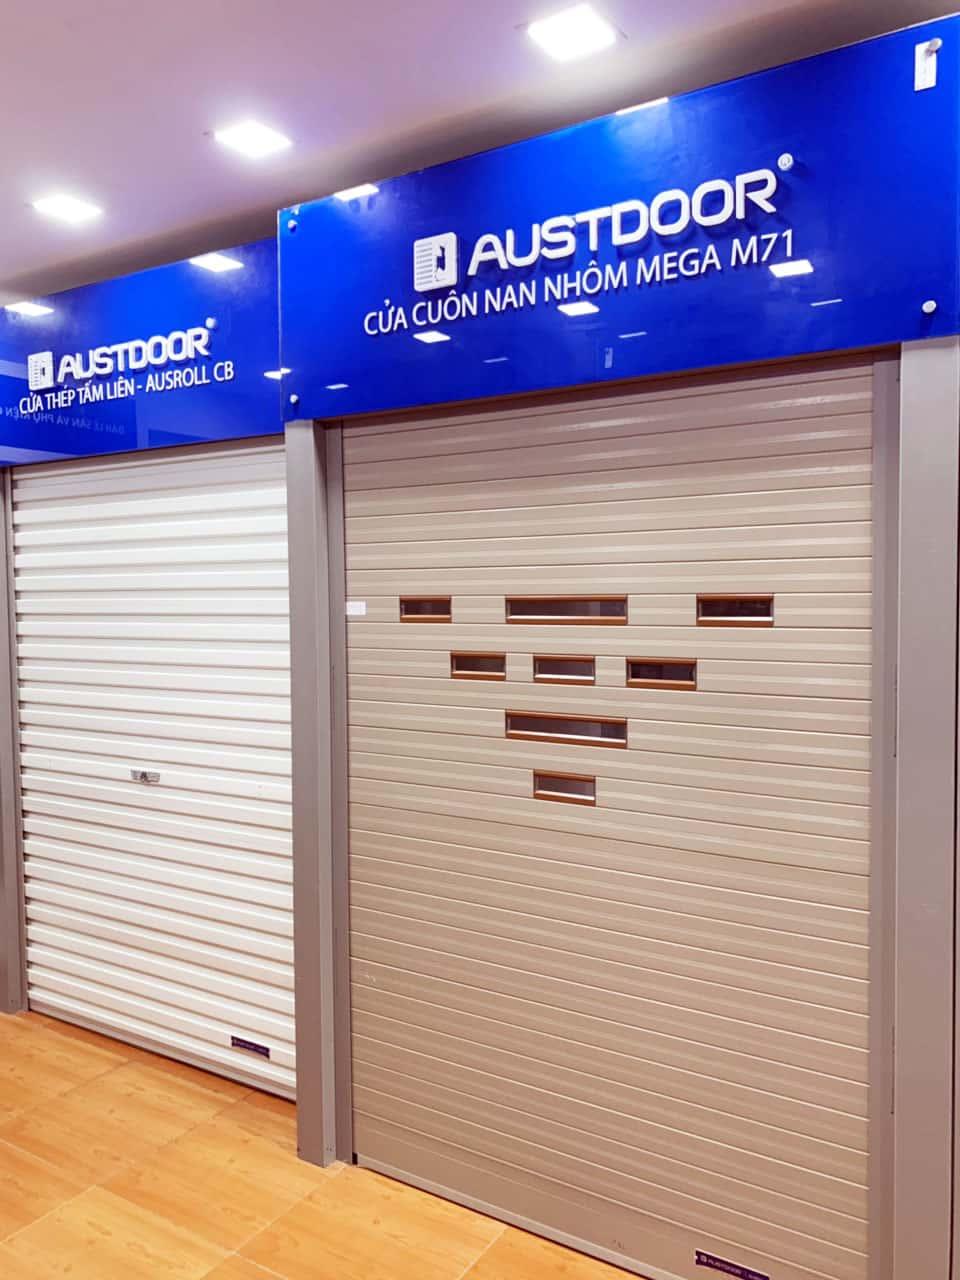 Cửa cuốn austdoor M70 tại showroom bách việt